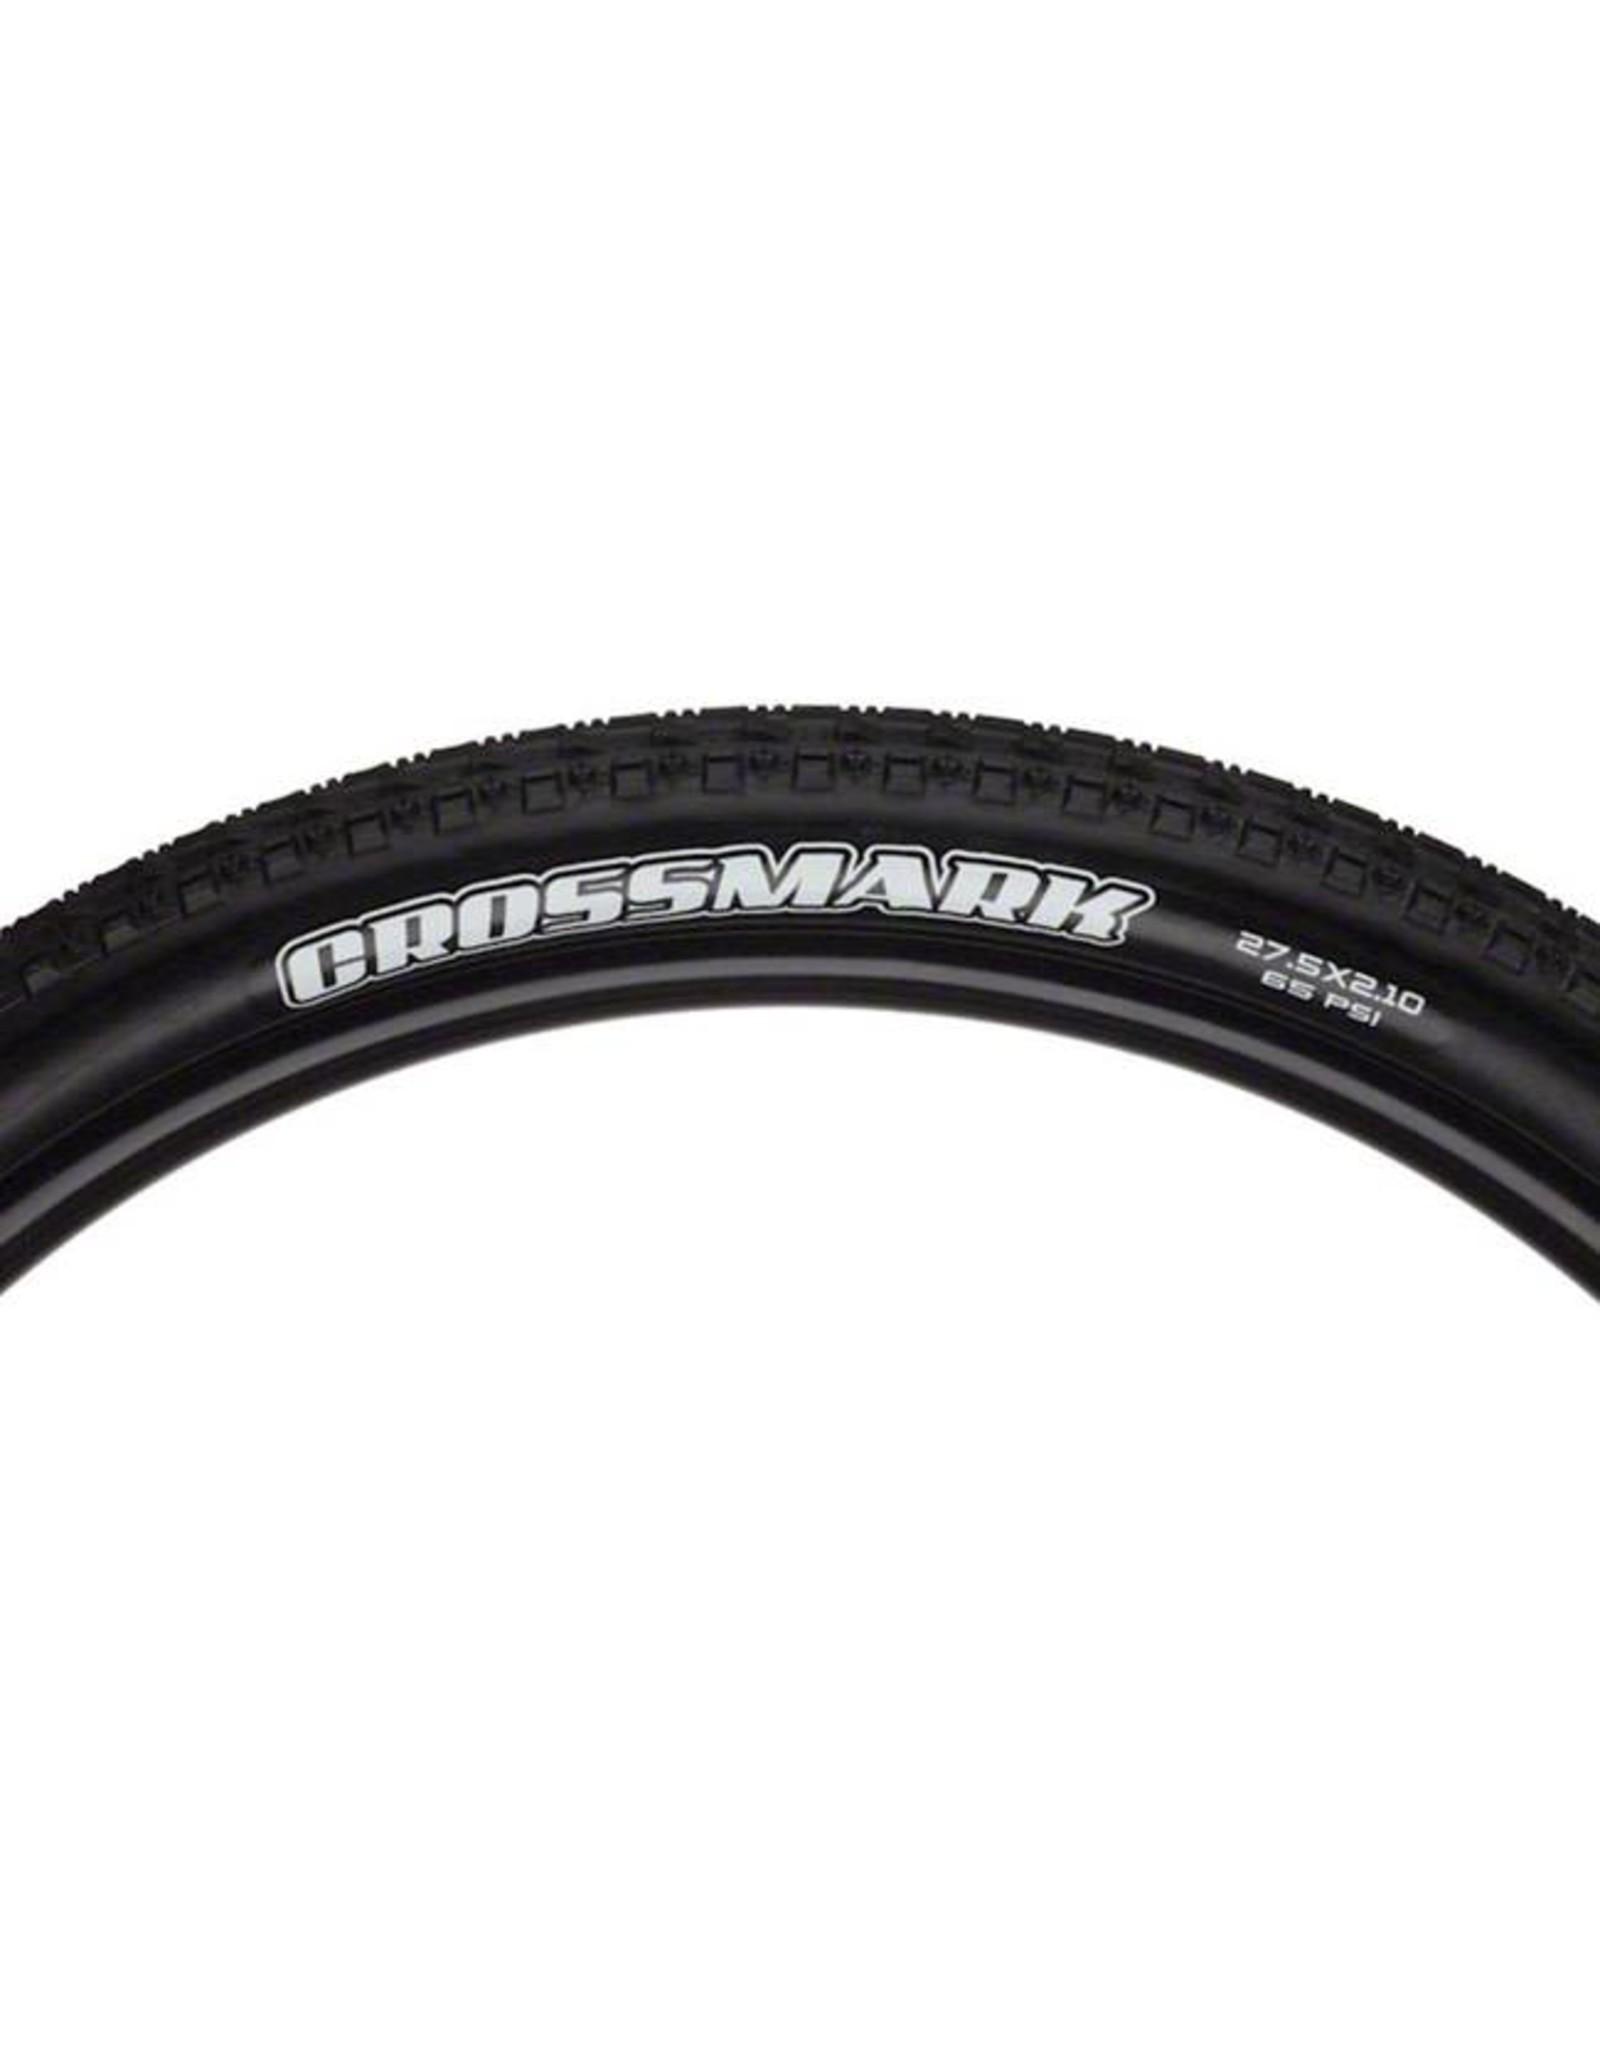 "Maxxis Maxxis Crossmark Tire: 27.5 x 2.10"", Folding, 120tpi, Single Compound, Black"